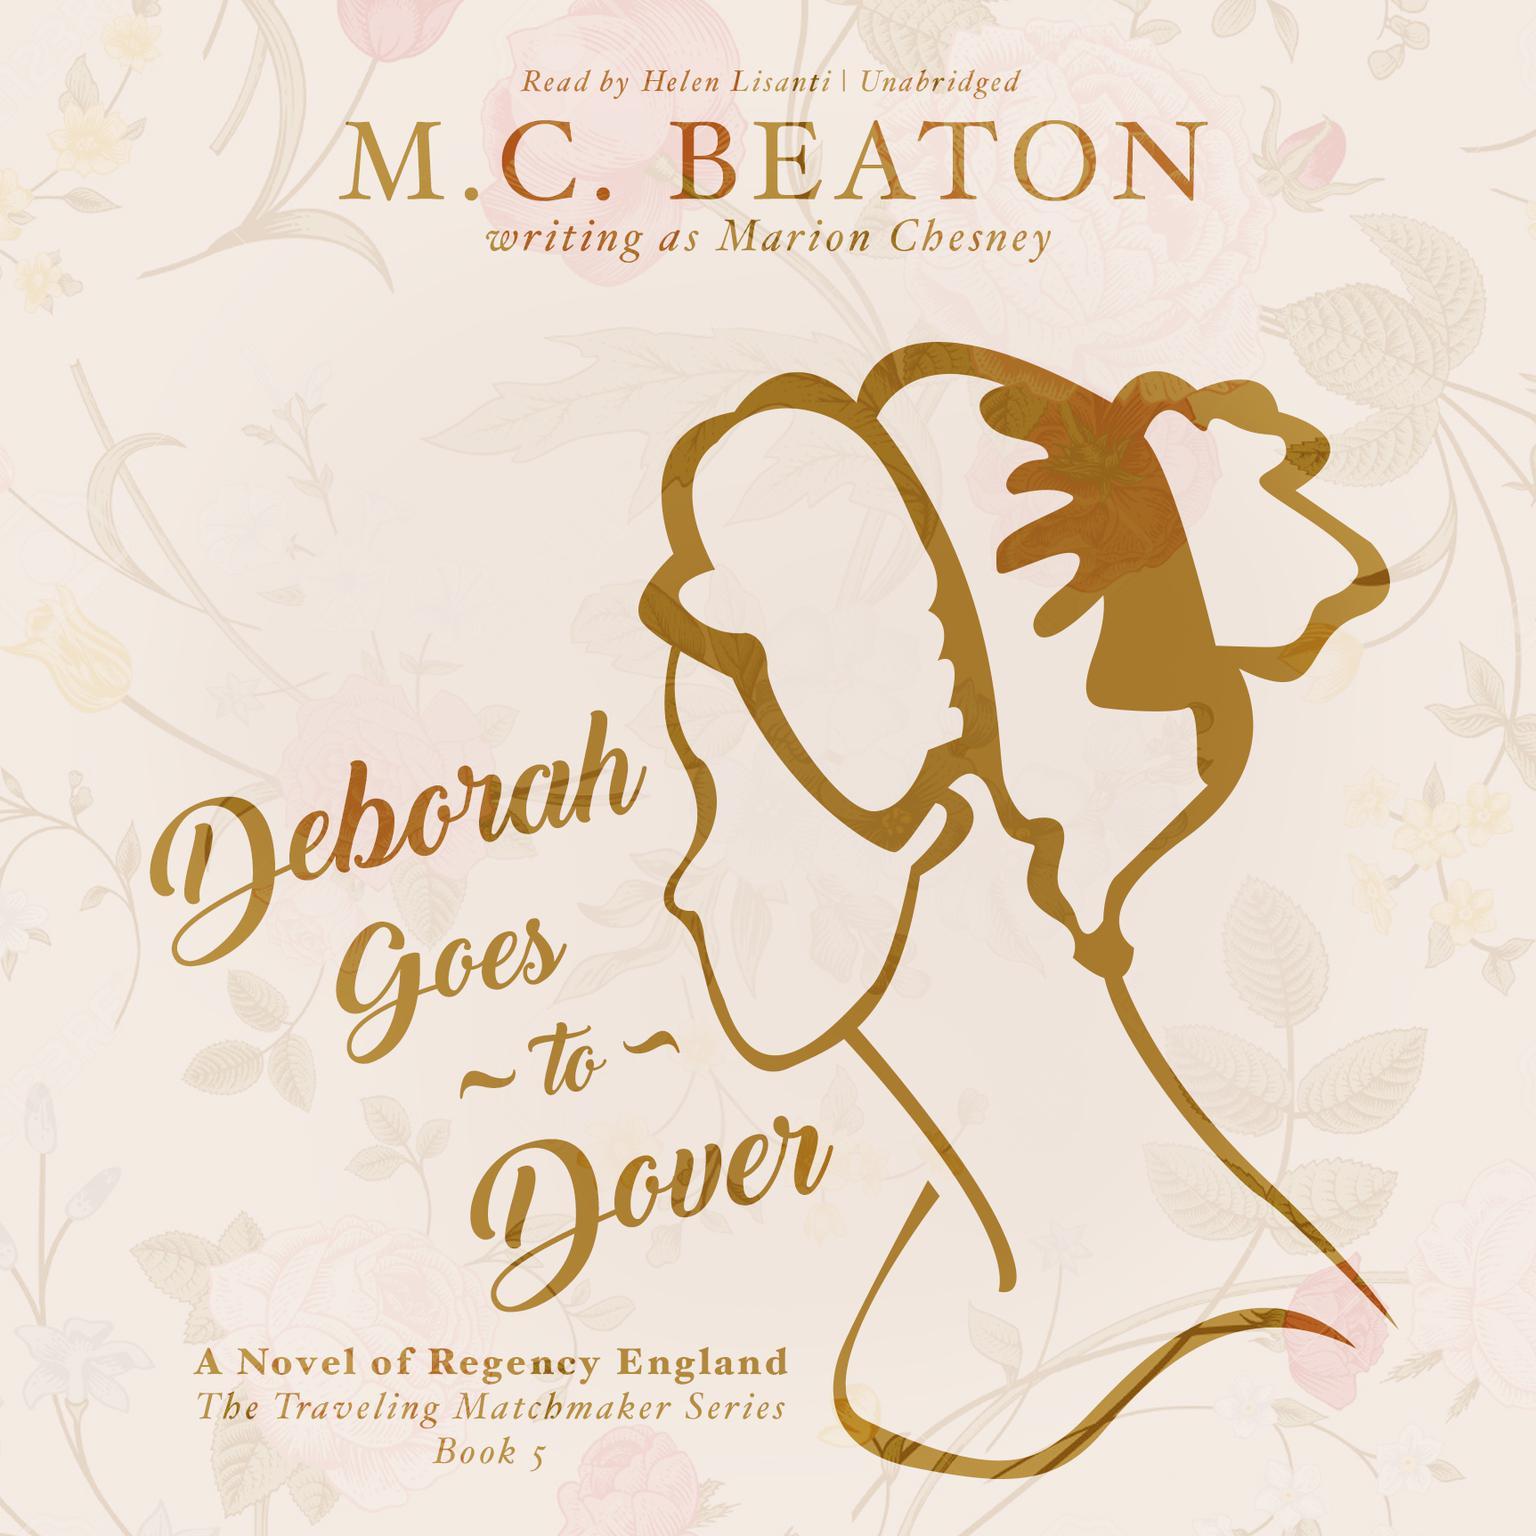 Deborah Goes to Dover: A Novel of Regency England Audiobook, by M. C. Beaton